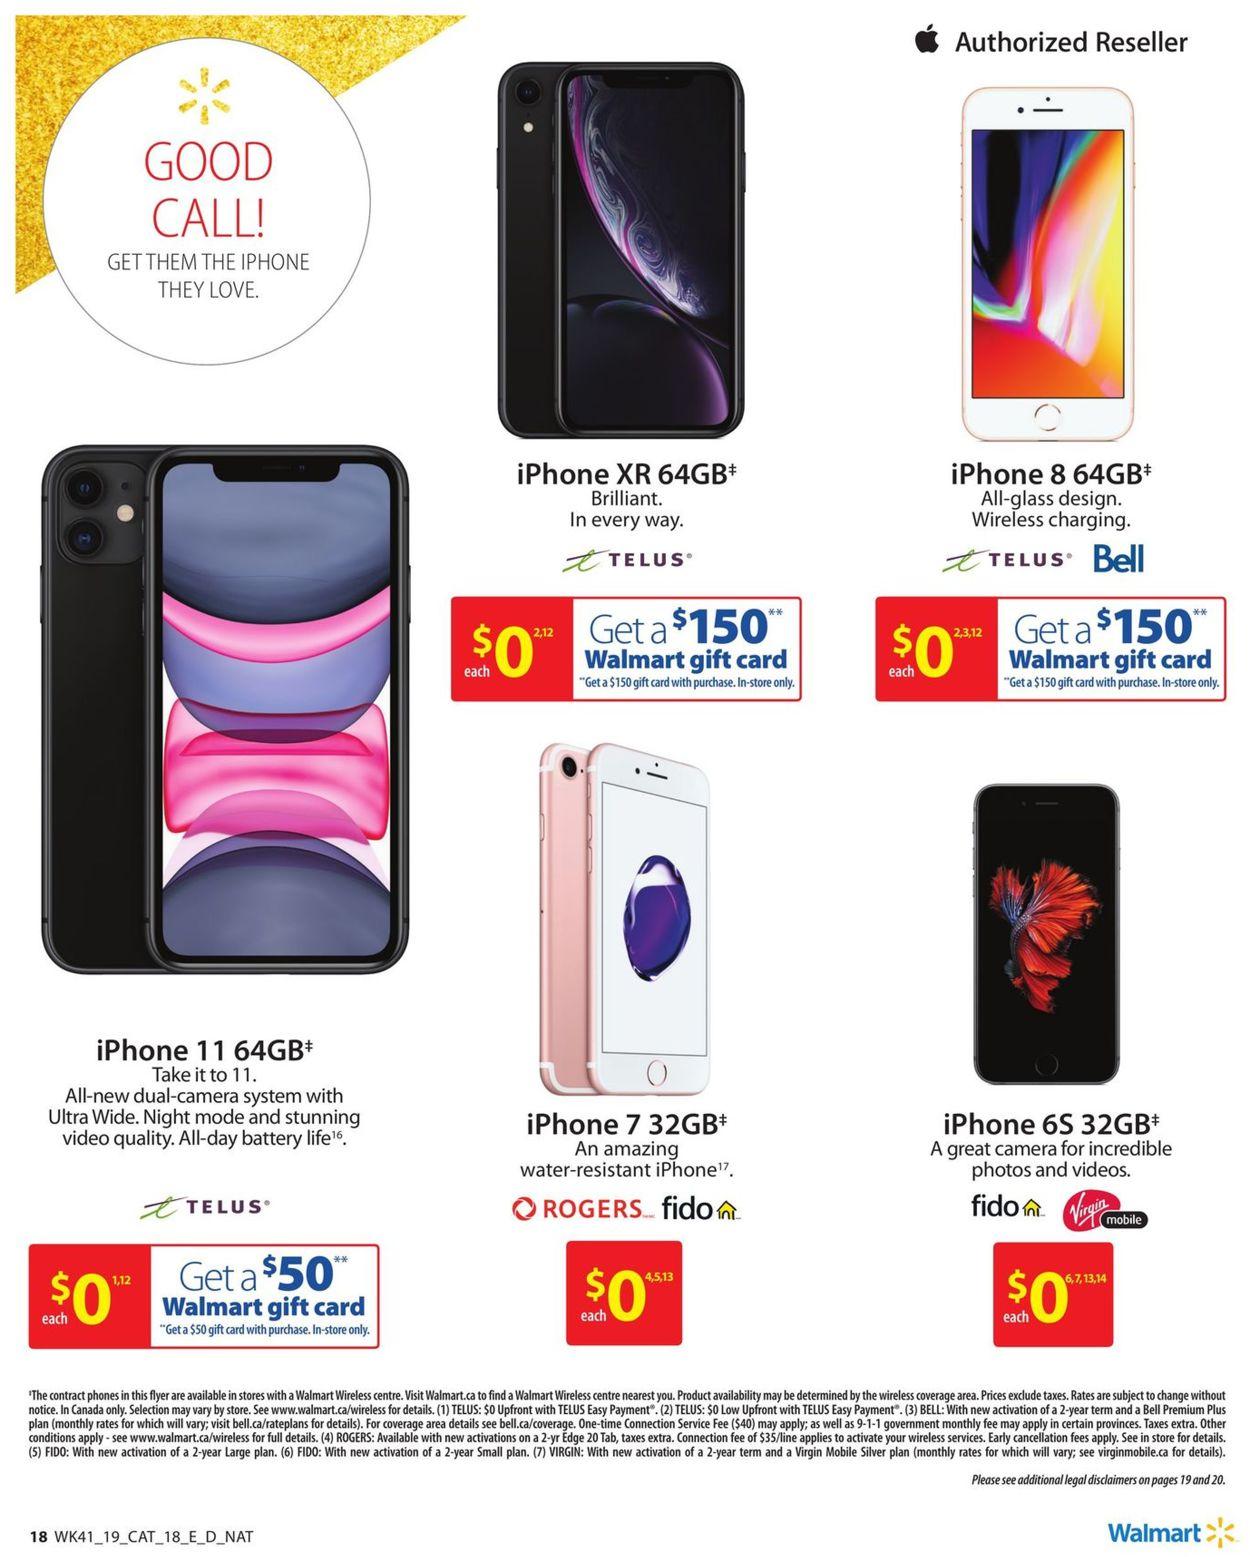 Walmart Flyer - 10/31-11/27/2019 (Page 18)